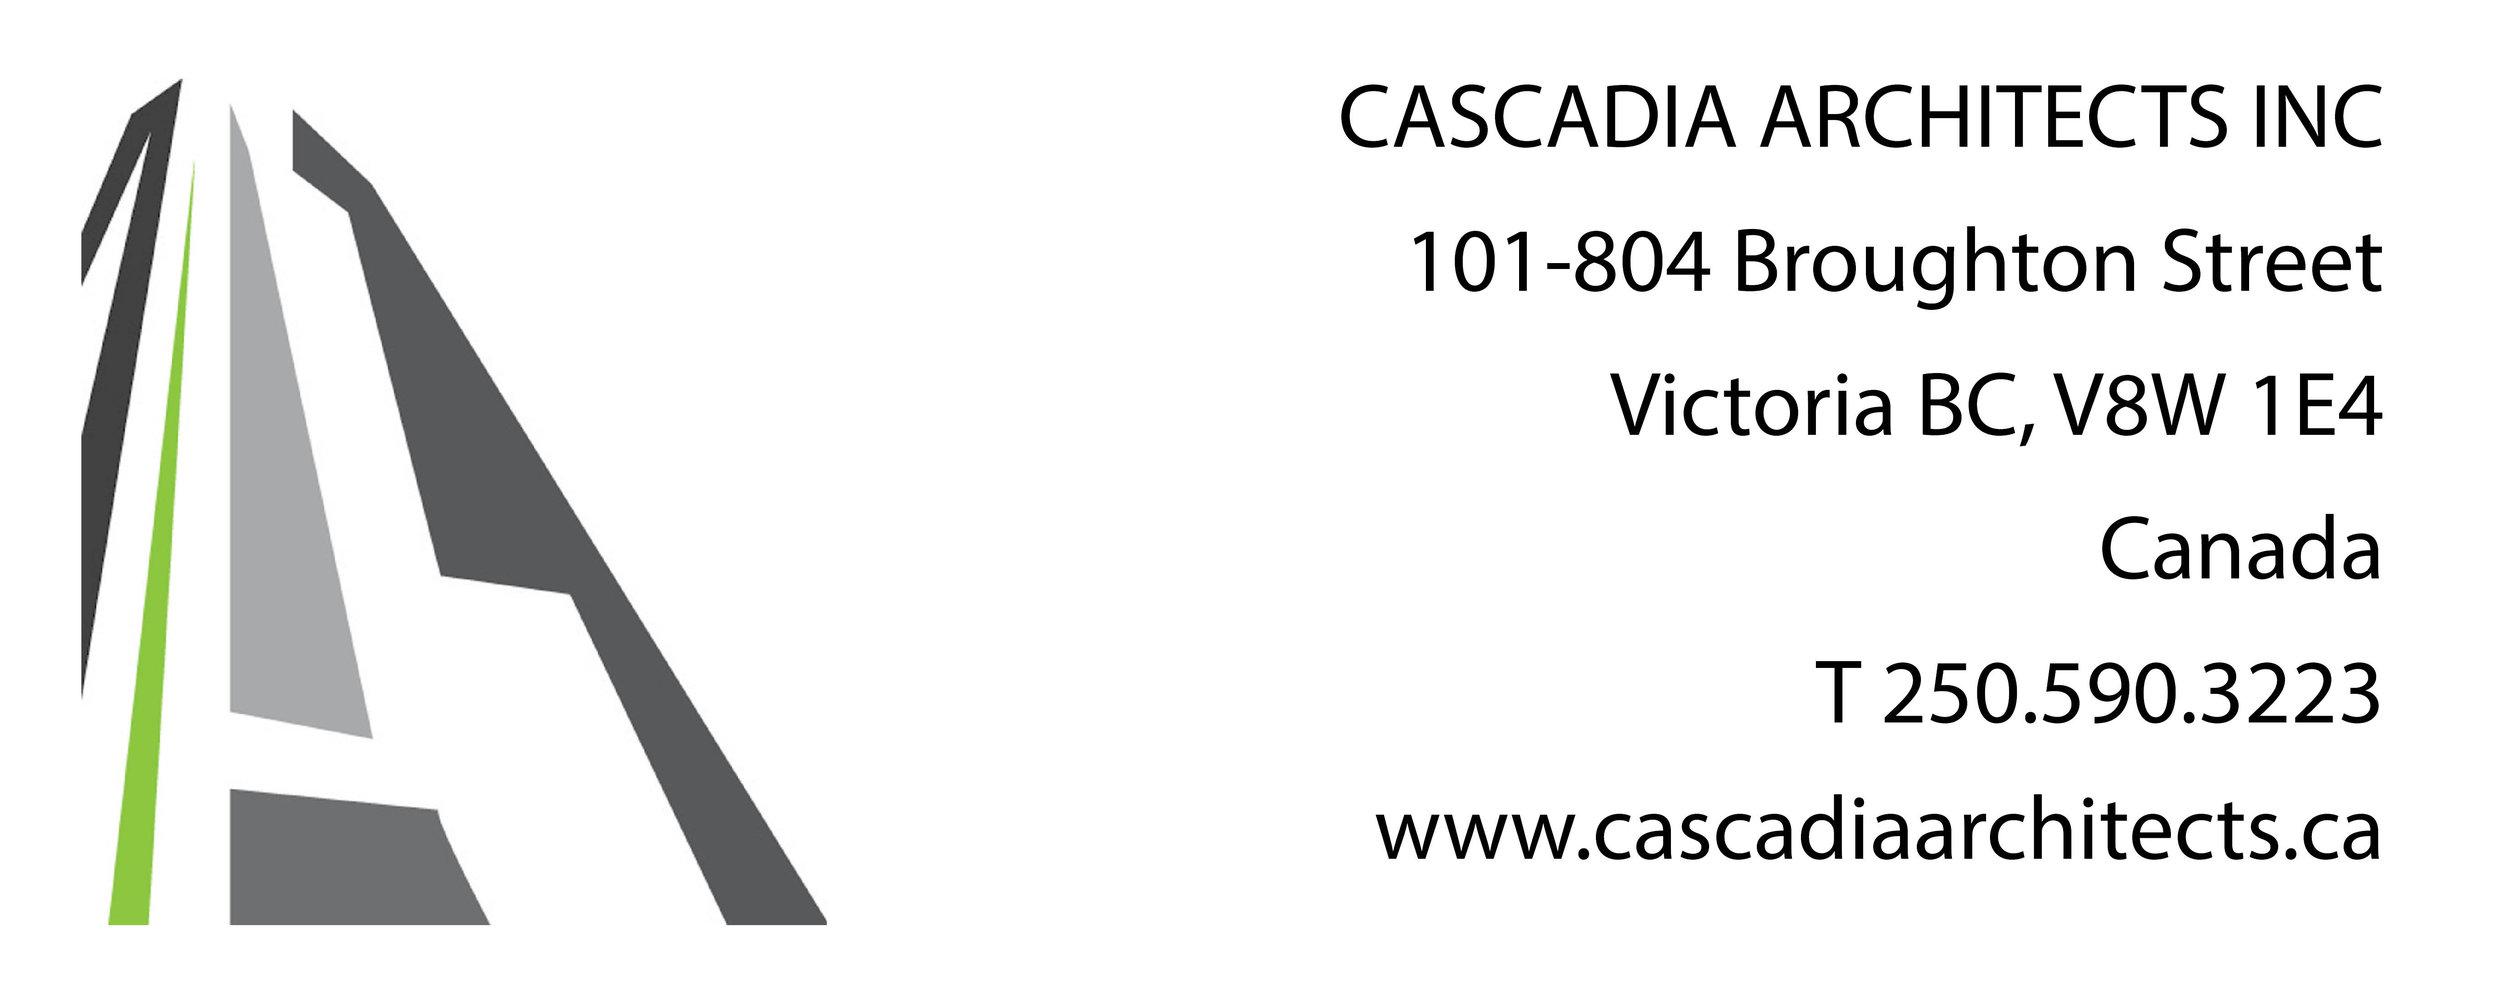 Address and logo only-Nov 2018.jpg